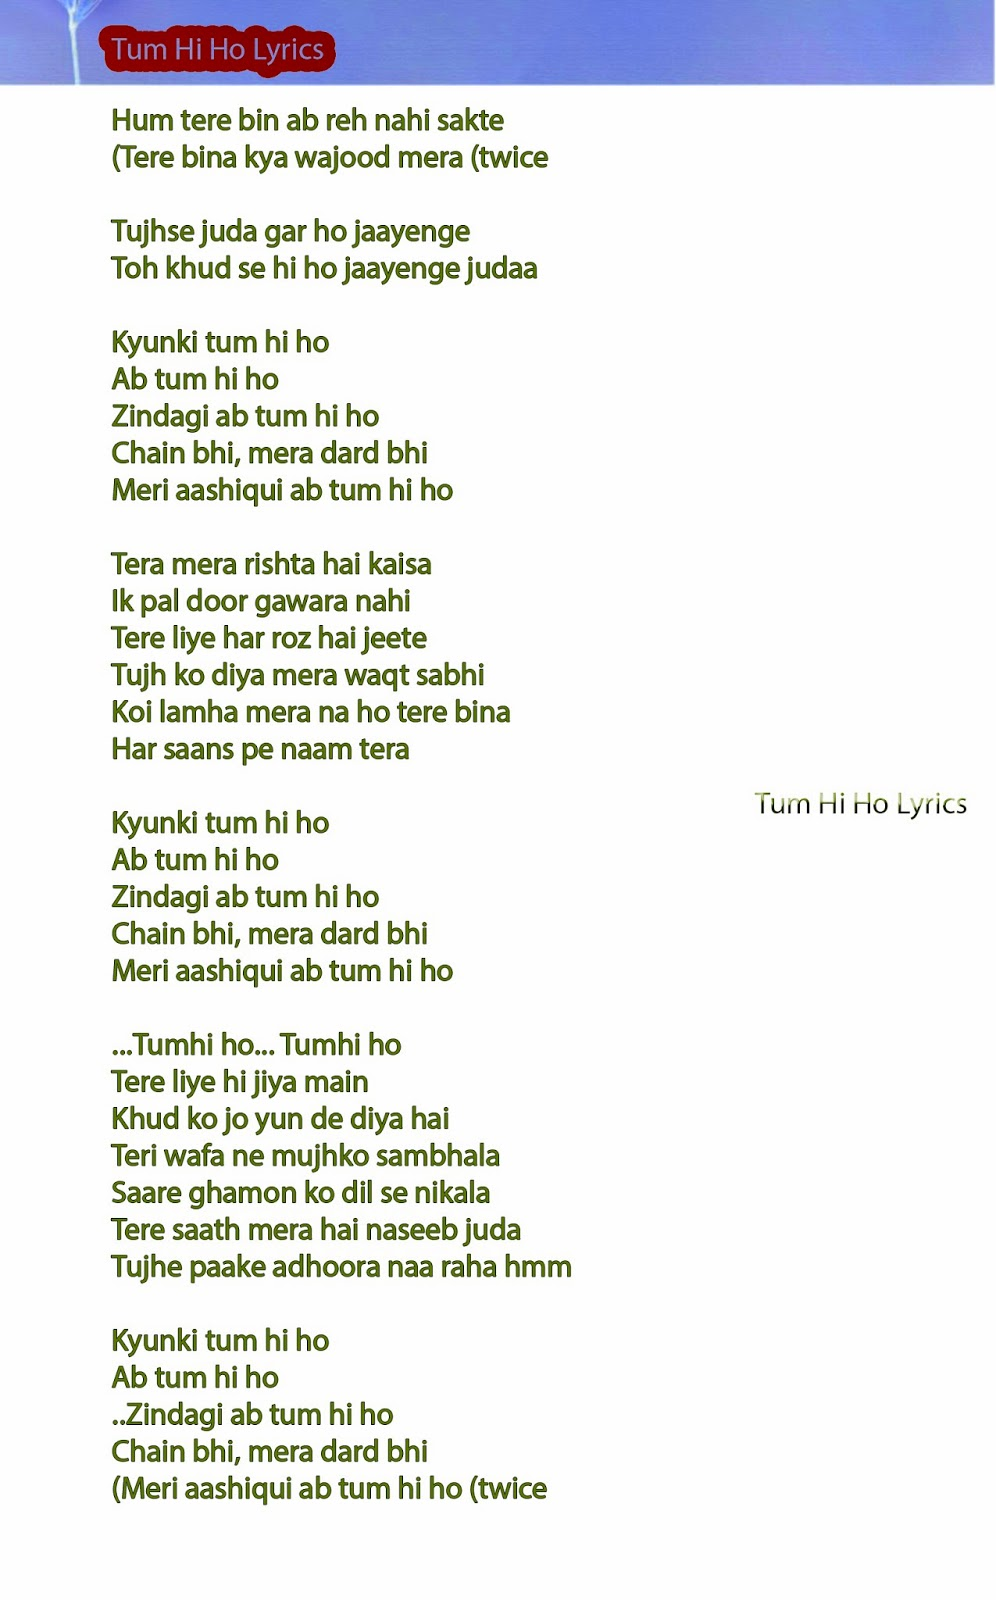 Tera hijr mera naseeb hai lyrics